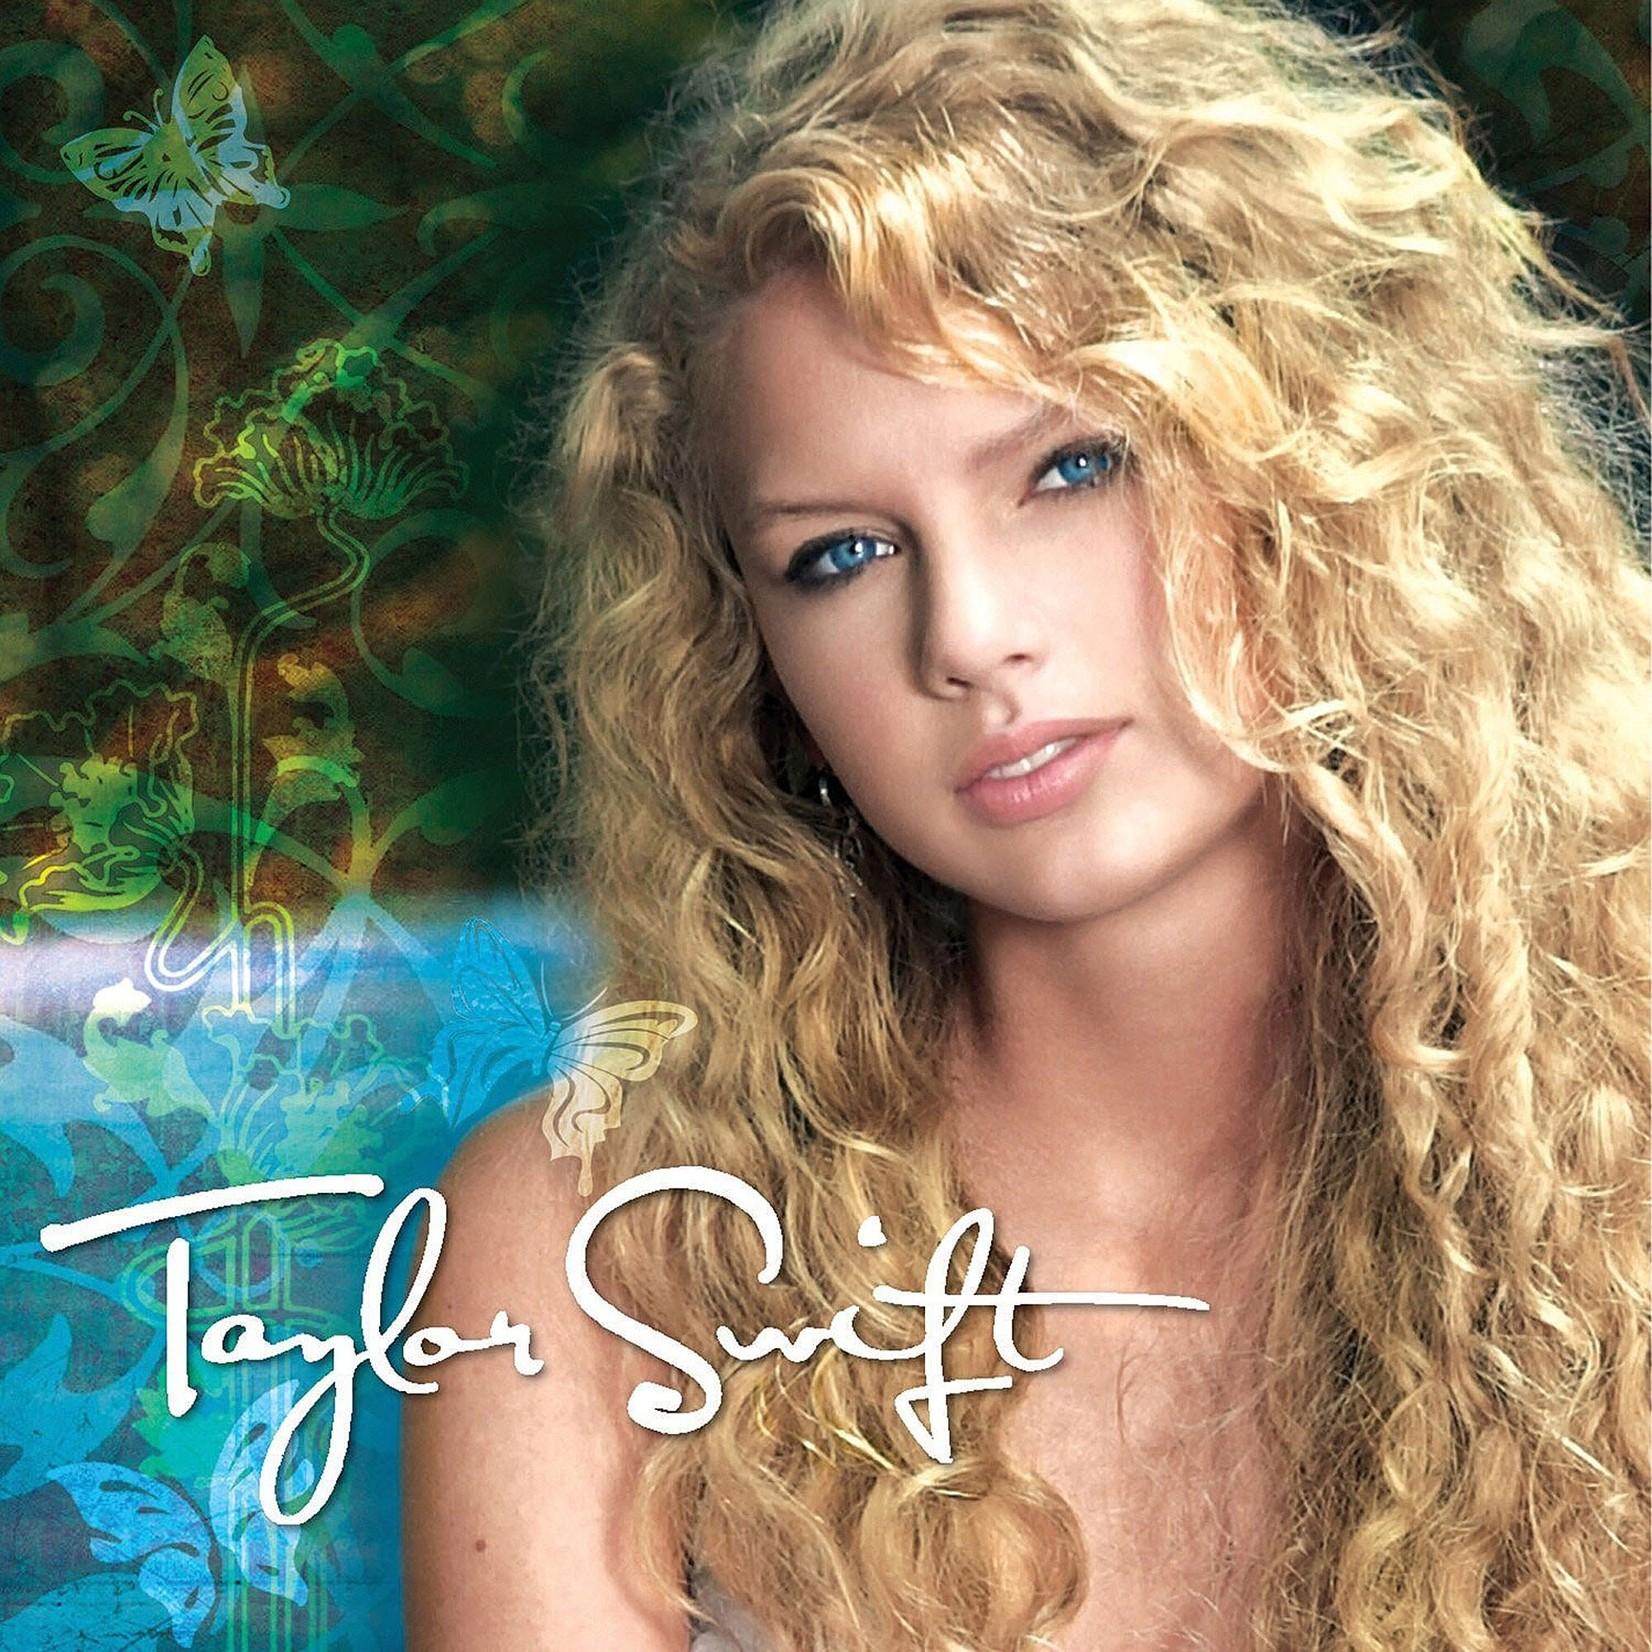 Monostereo Taylor Swift Taylor Swift (Gatefold LP Jacket, 2 LPs)